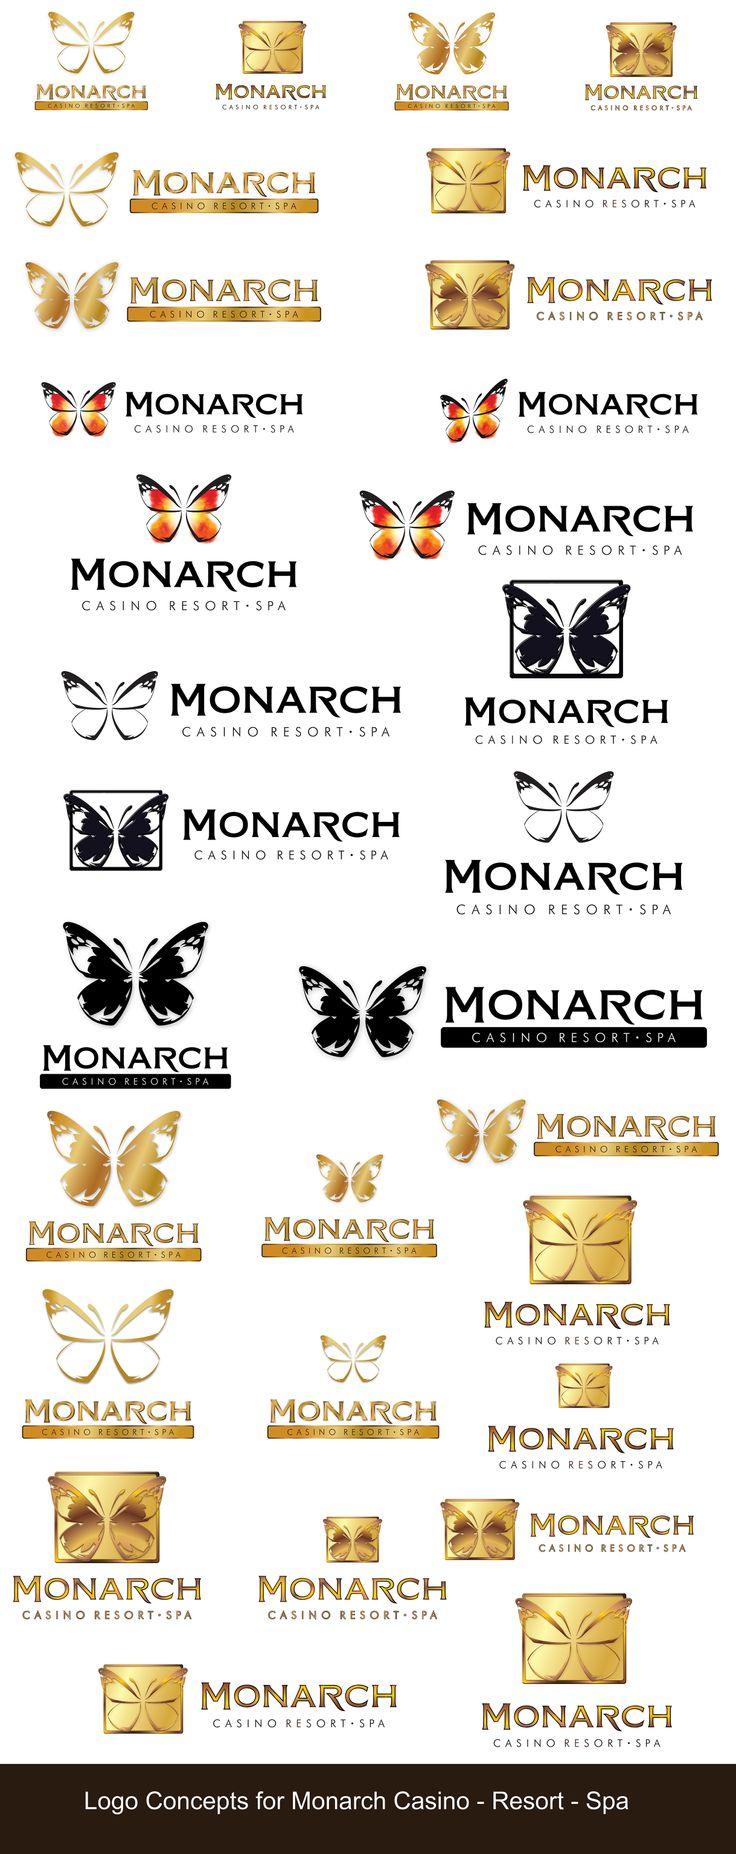 Logo Concepts for Monarch Casino - Resort - Spa.  Designed by Kathy Morton Stanion.